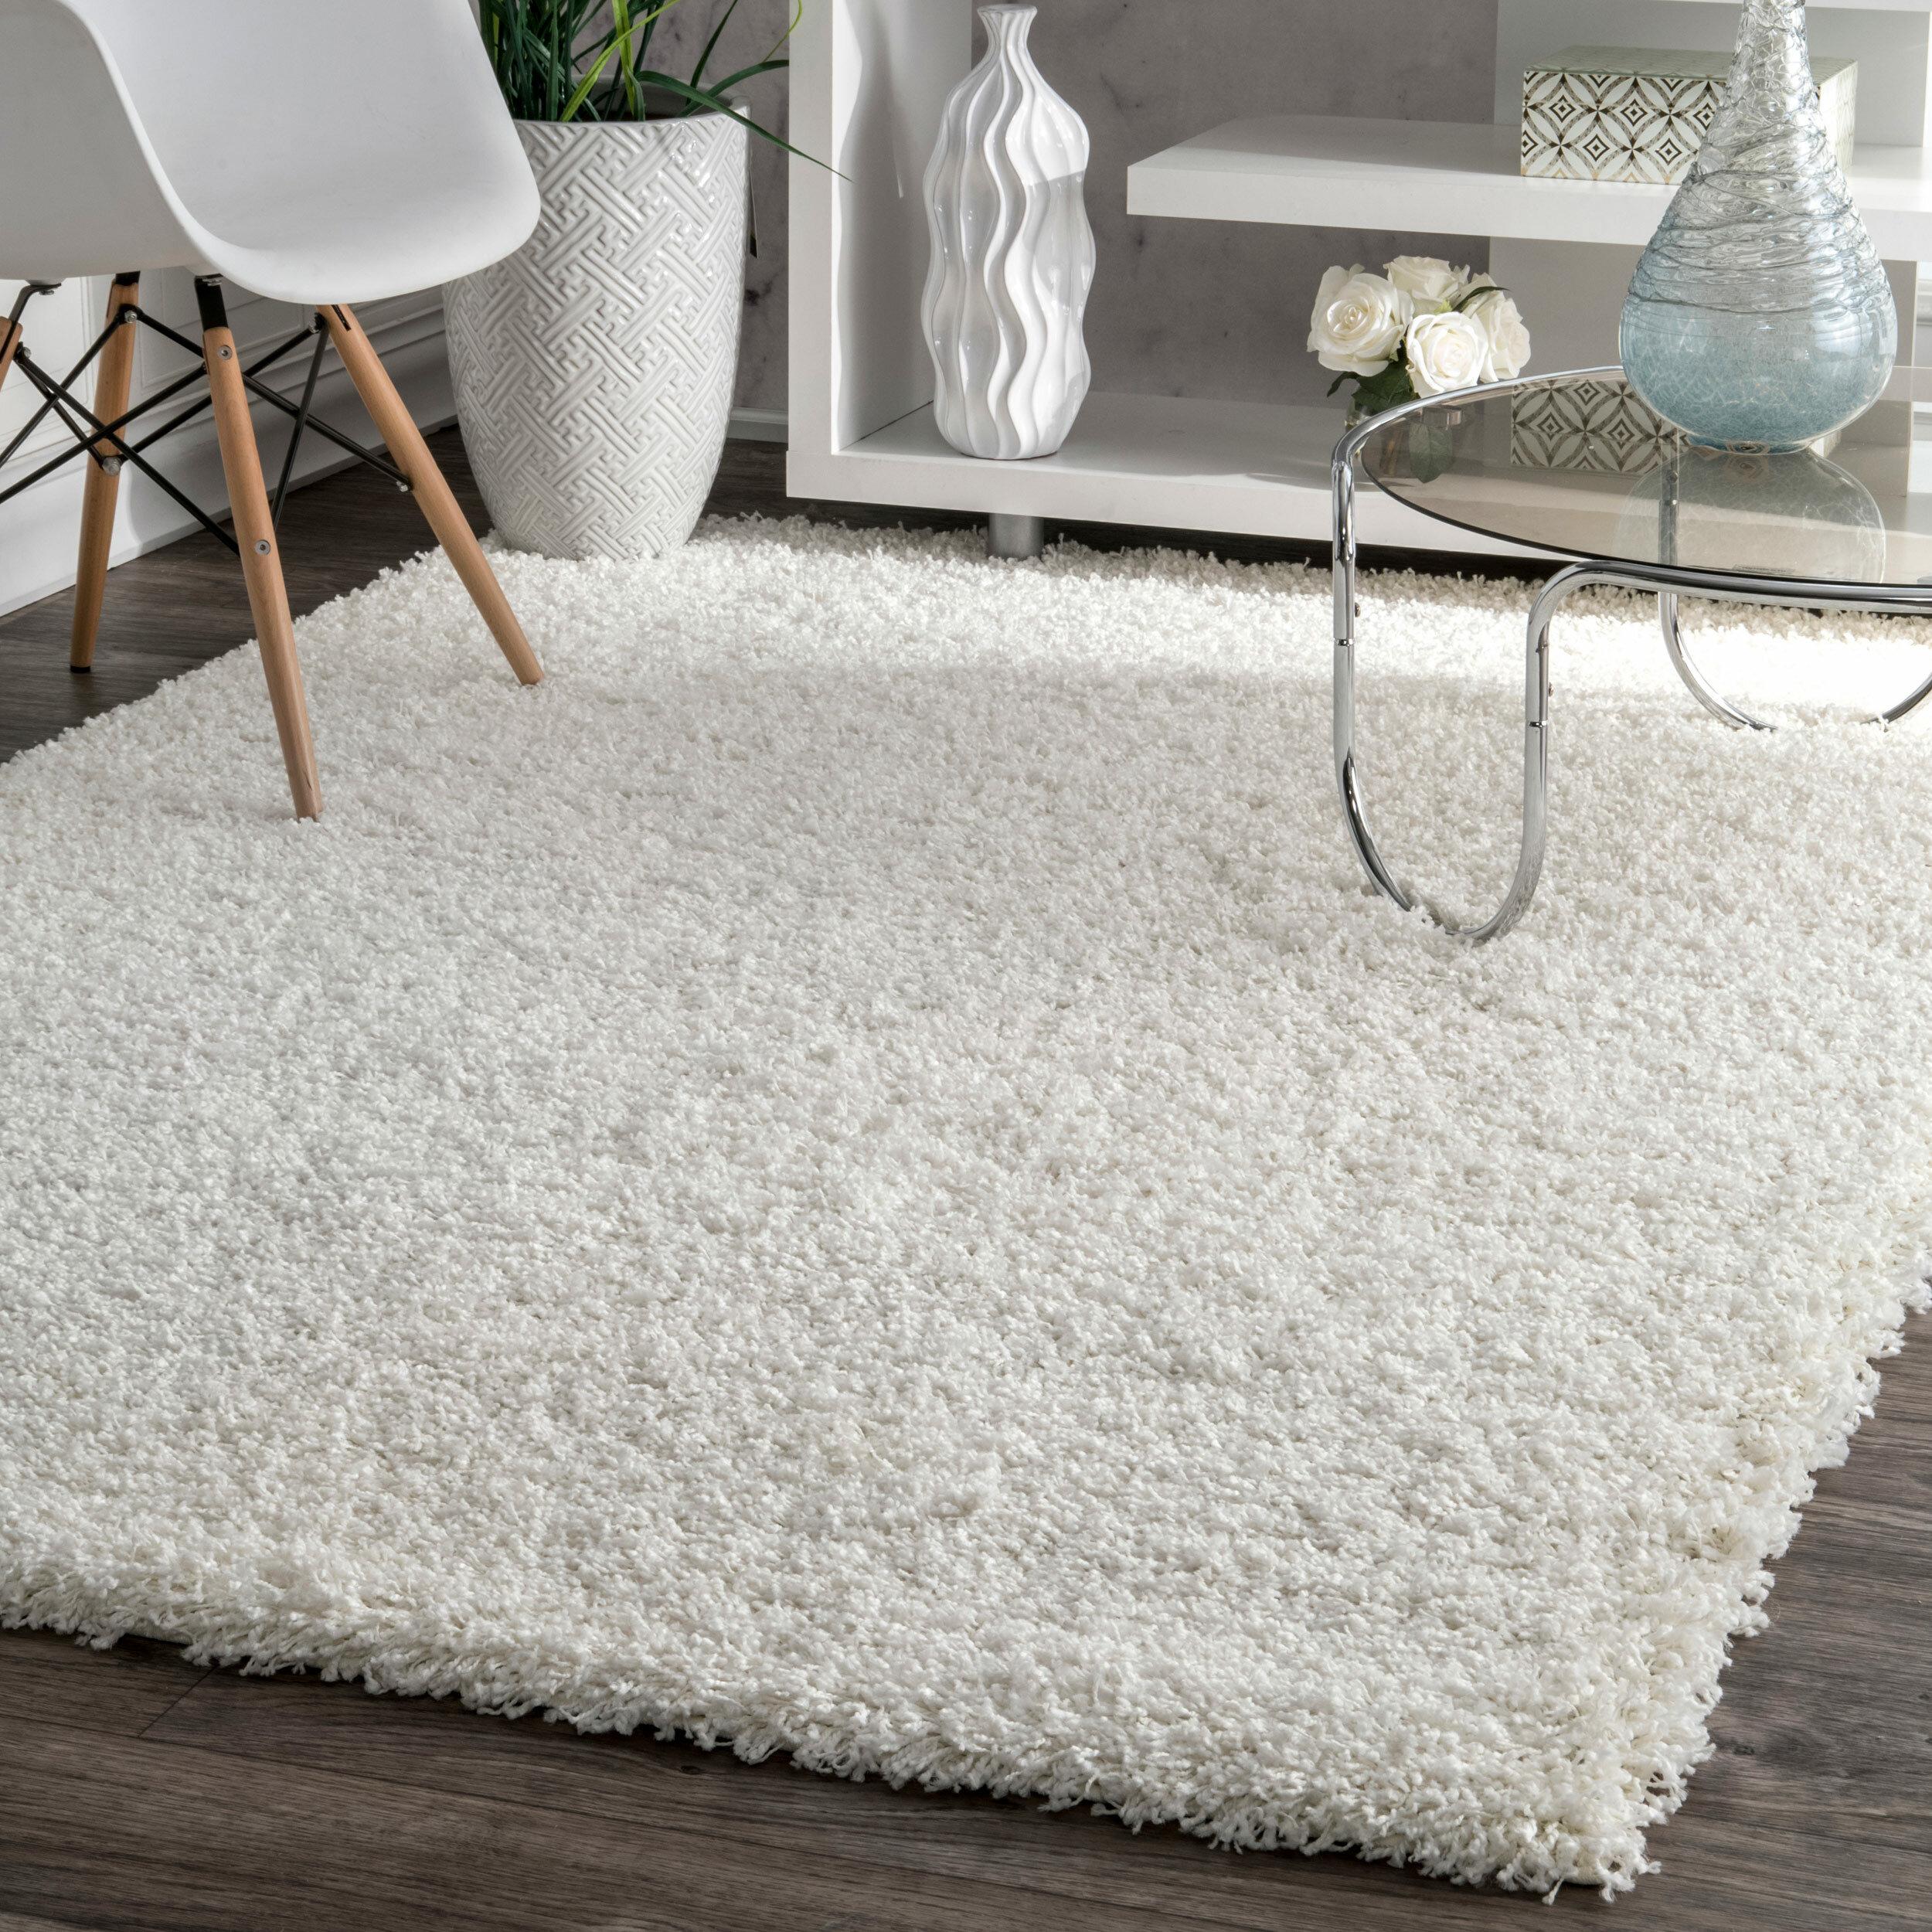 oyoytheworldrug order products white rug oyoy pre globalbabynz world img the soft